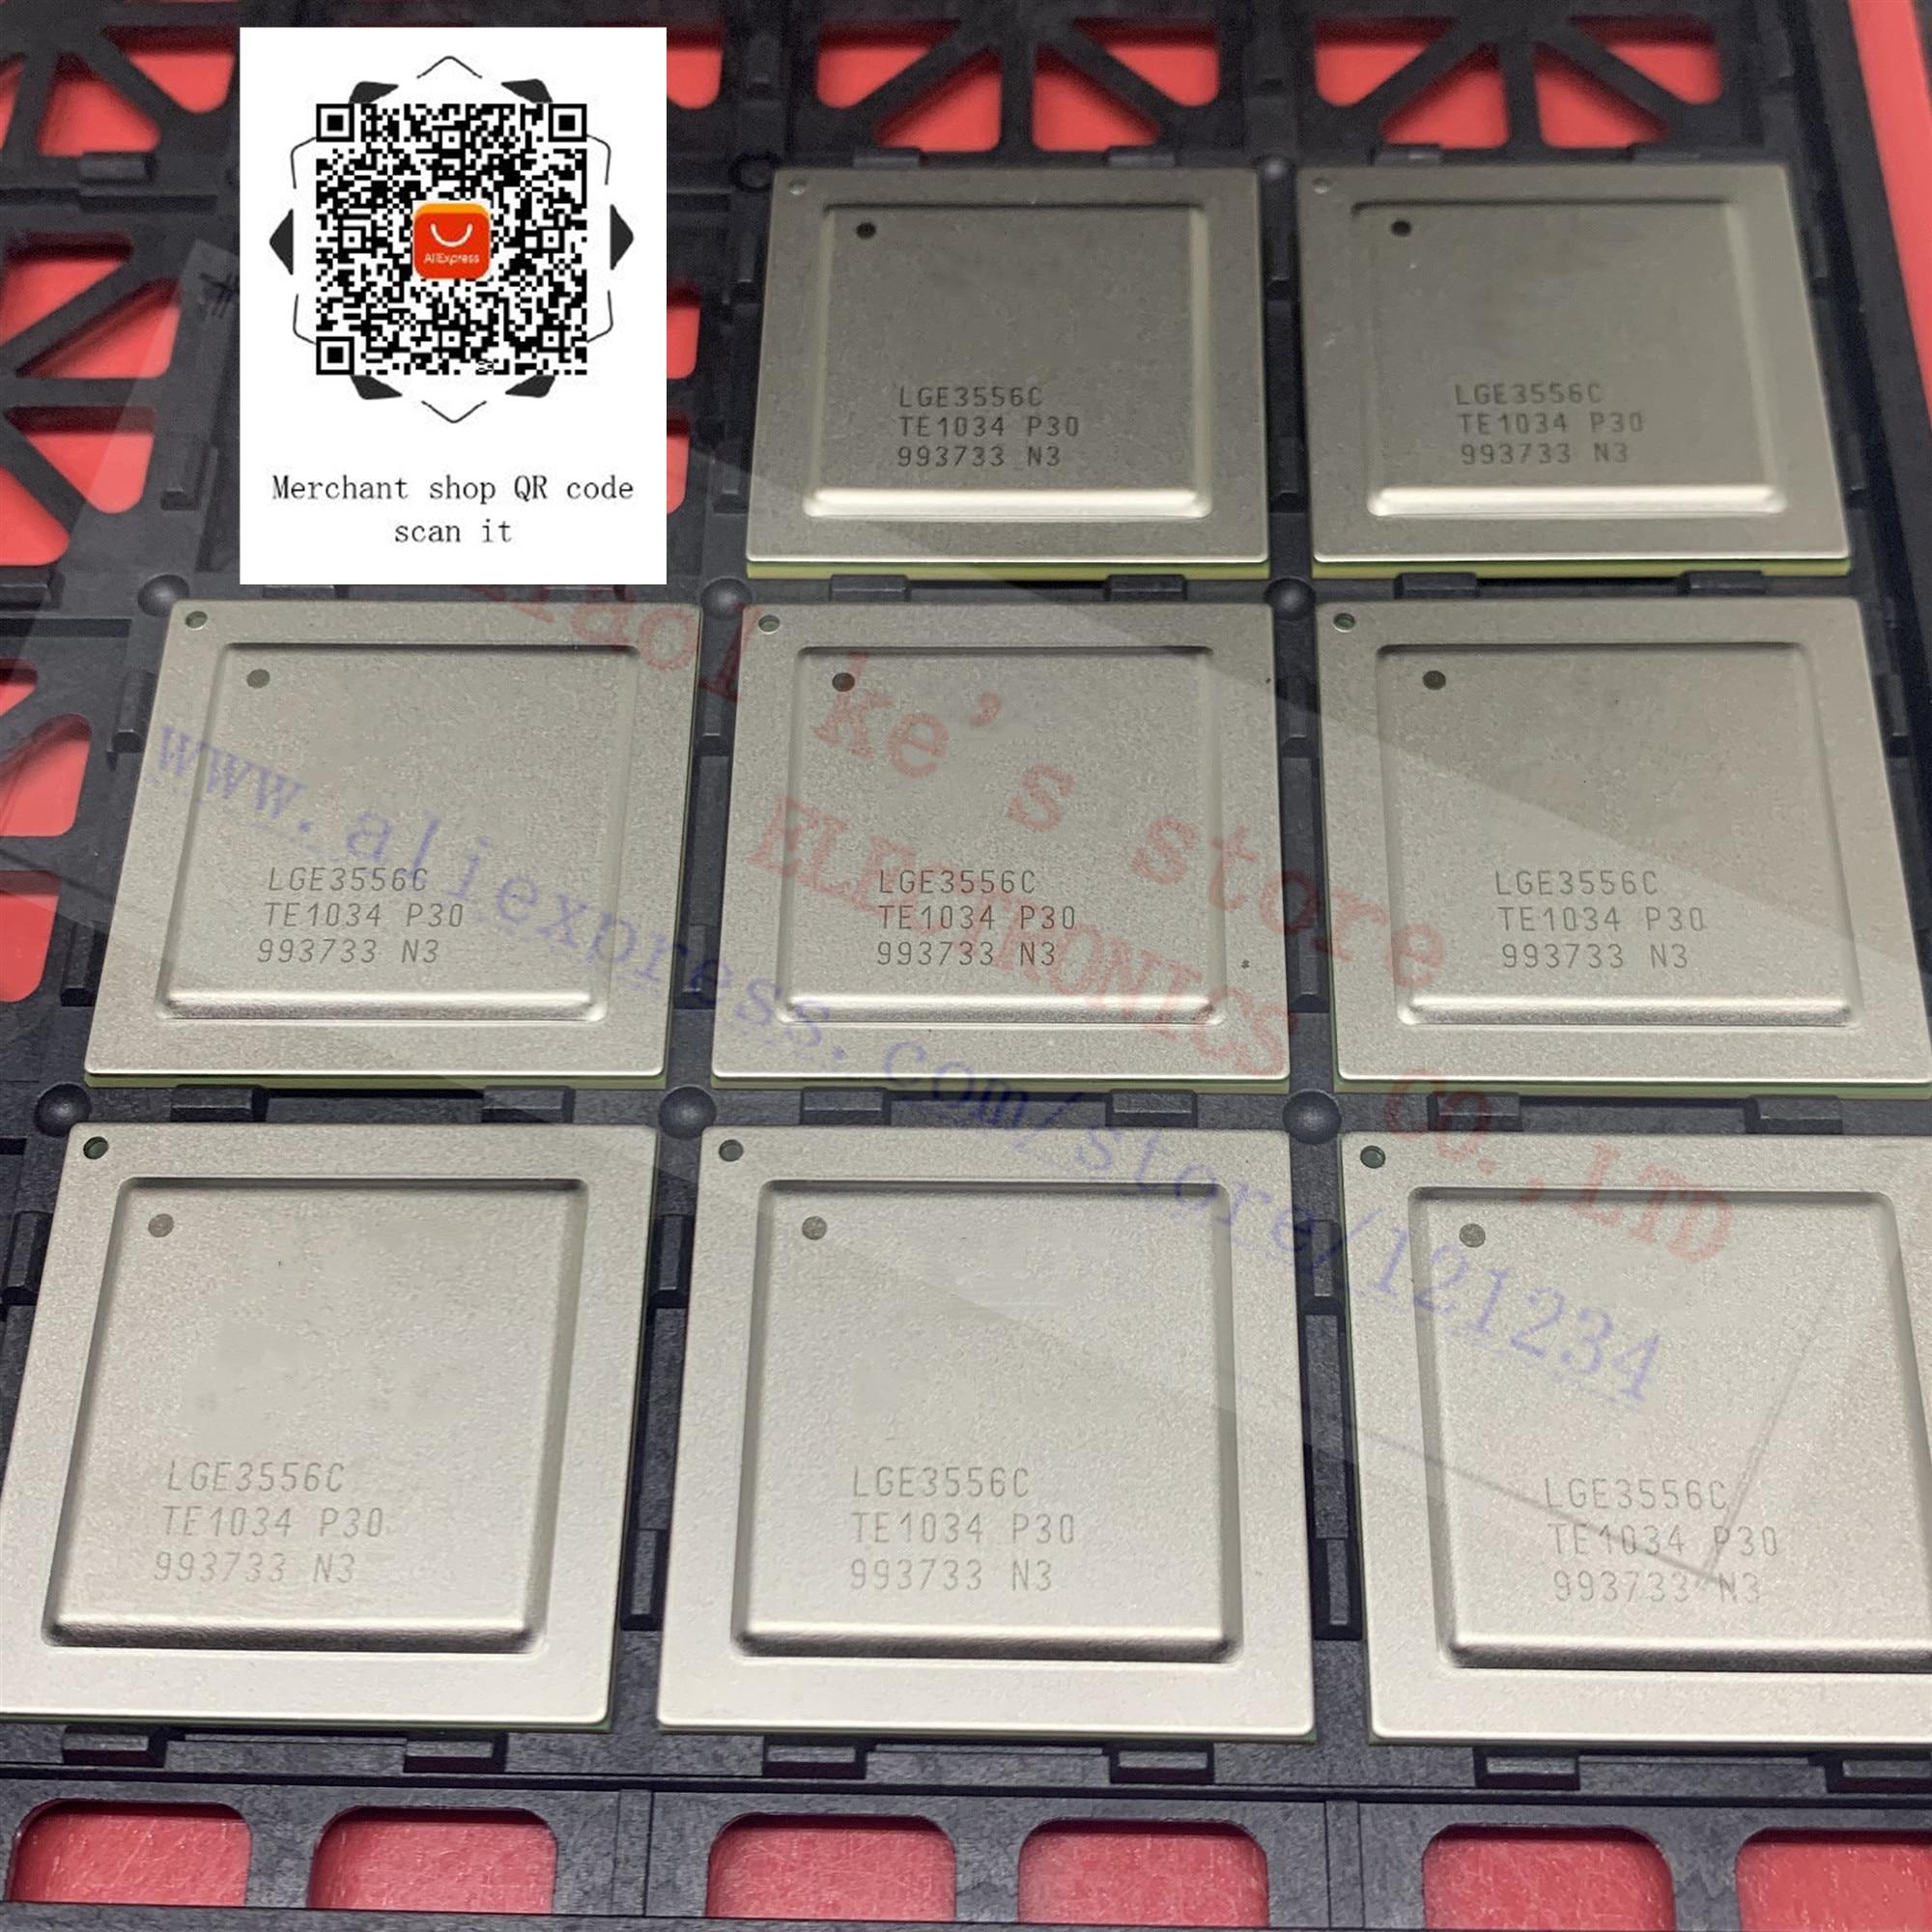 100% original novo; lge3556cp lge3556c lge3556 hd lcd tv chip novo local original